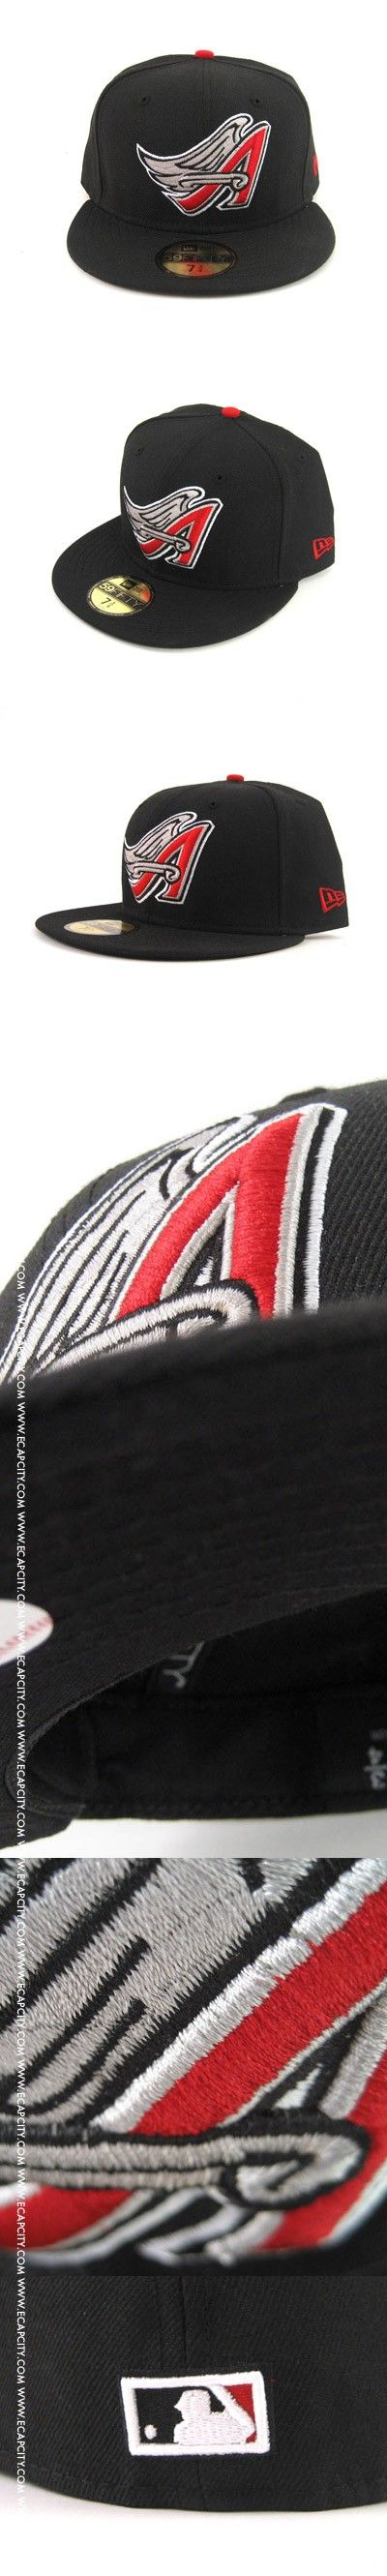 Anaheim Angels New Era Hat (AIR JORDAN IV RETRO)